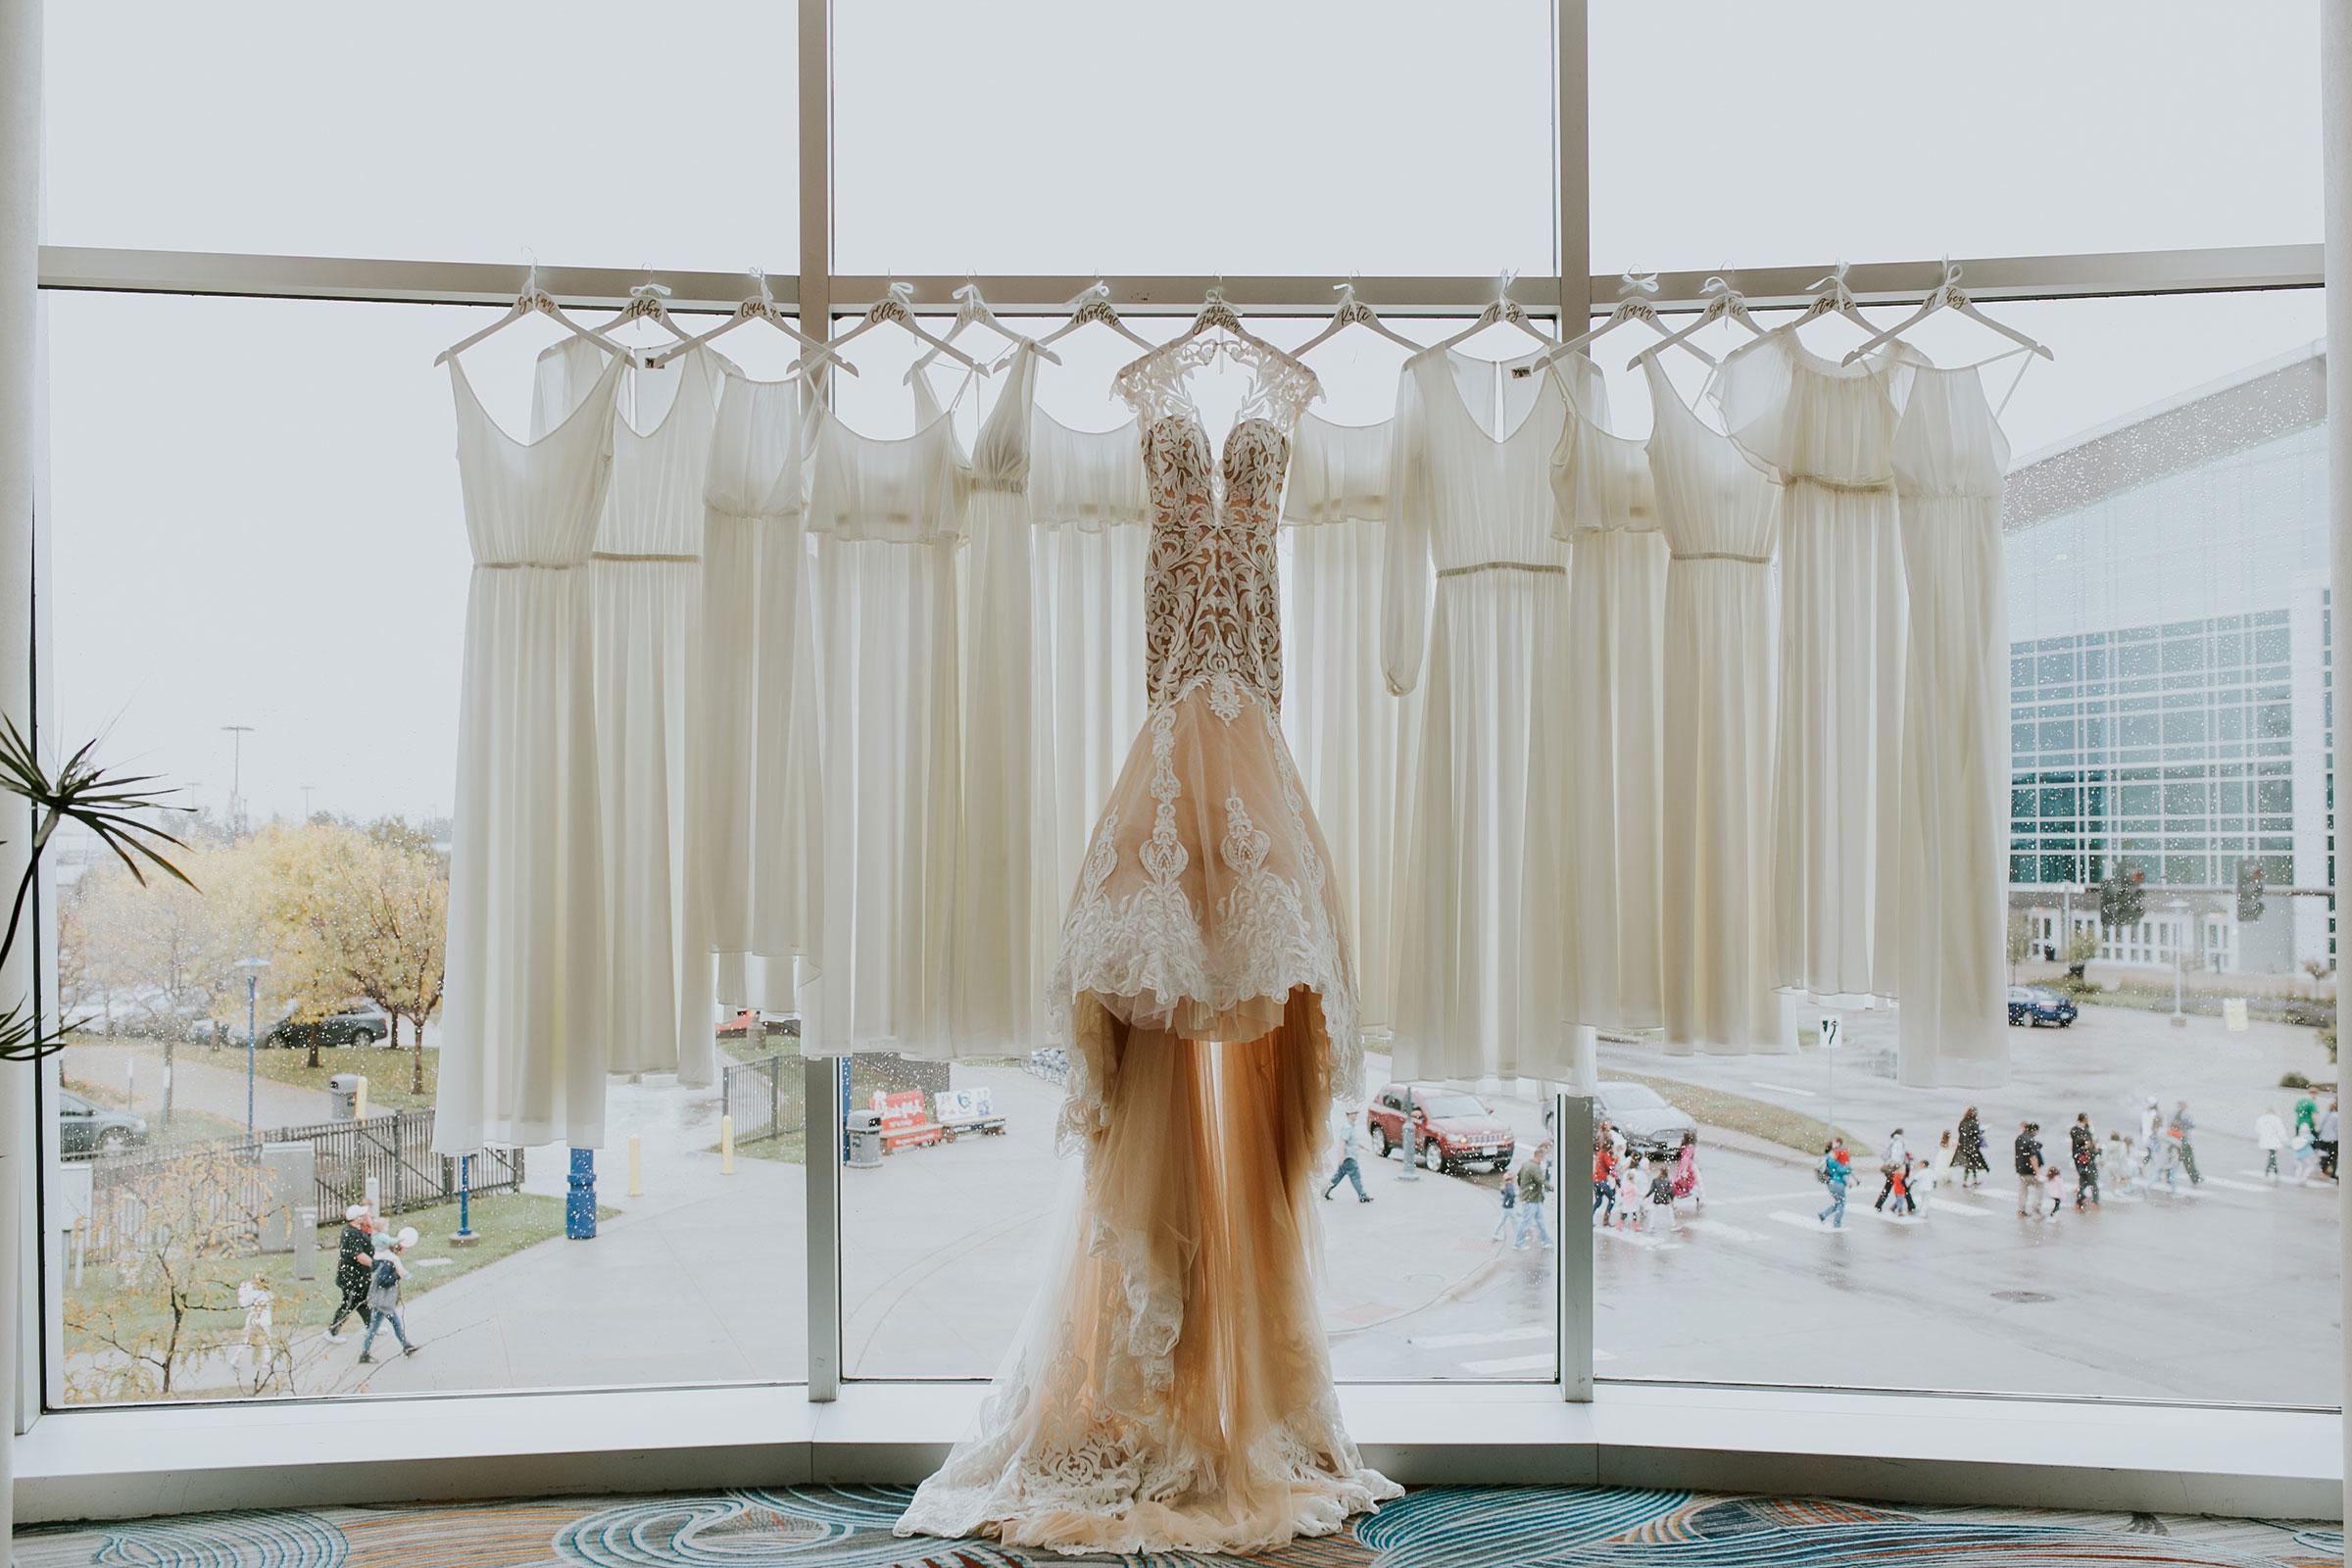 wedding-gown-and-bridesmaids-dresses-hanging-in-window-hilton-omaha-nebraska-raelyn-ramey-photography.jpg